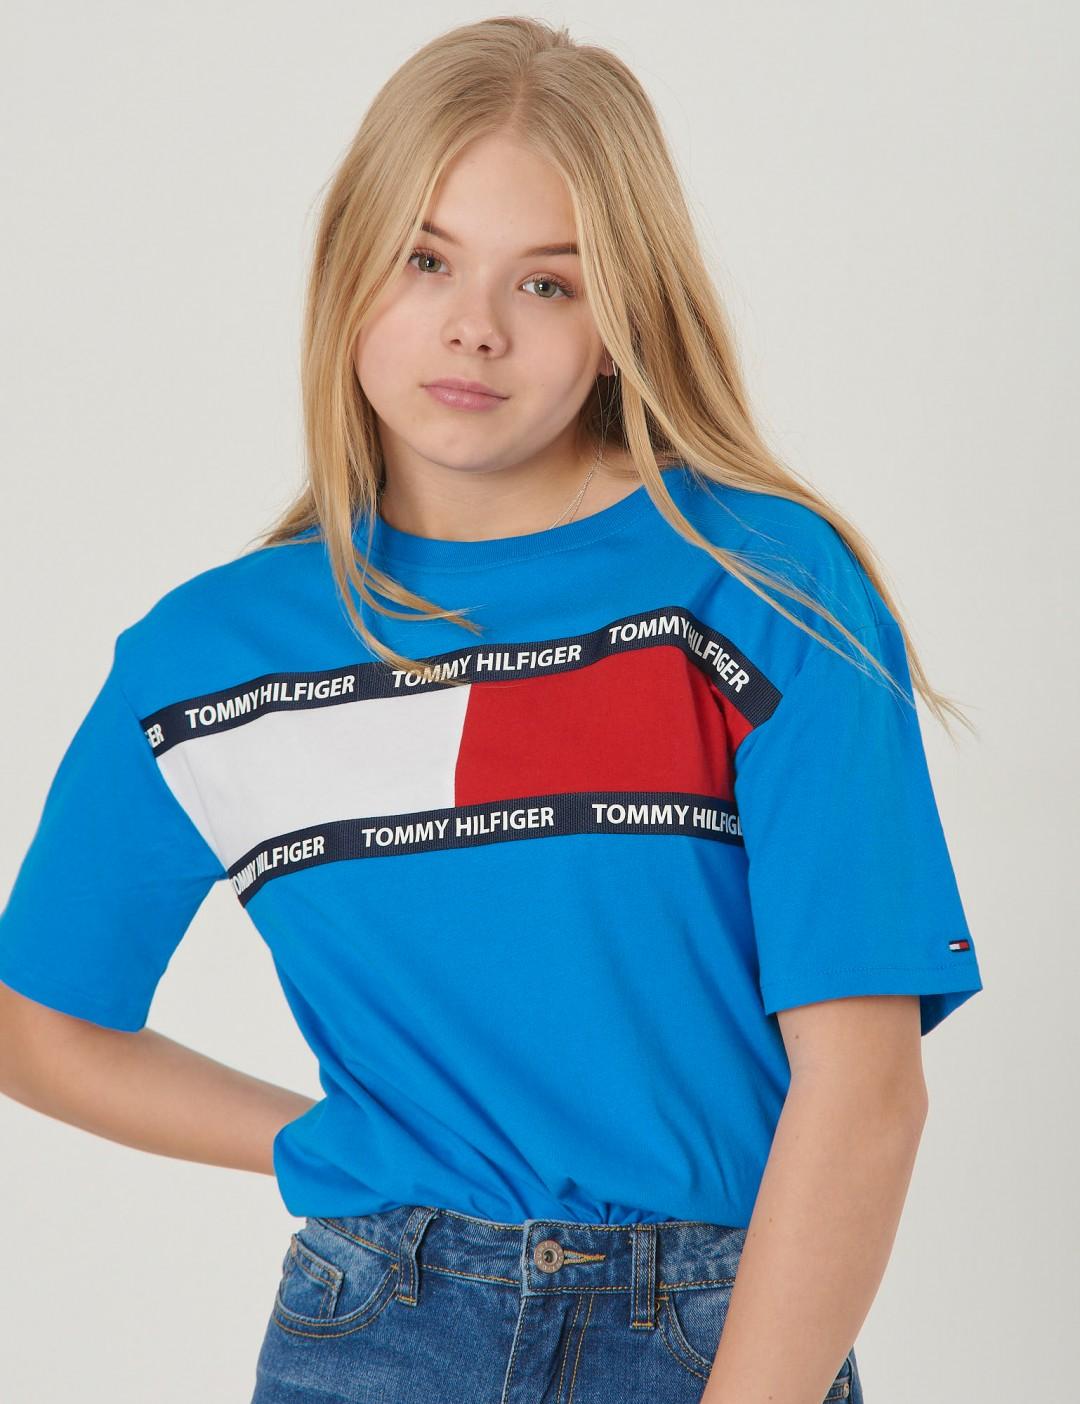 057b81f9 Om U Flag Tee S/s - Blå från Tommy Hilfiger | KidsBrandStore